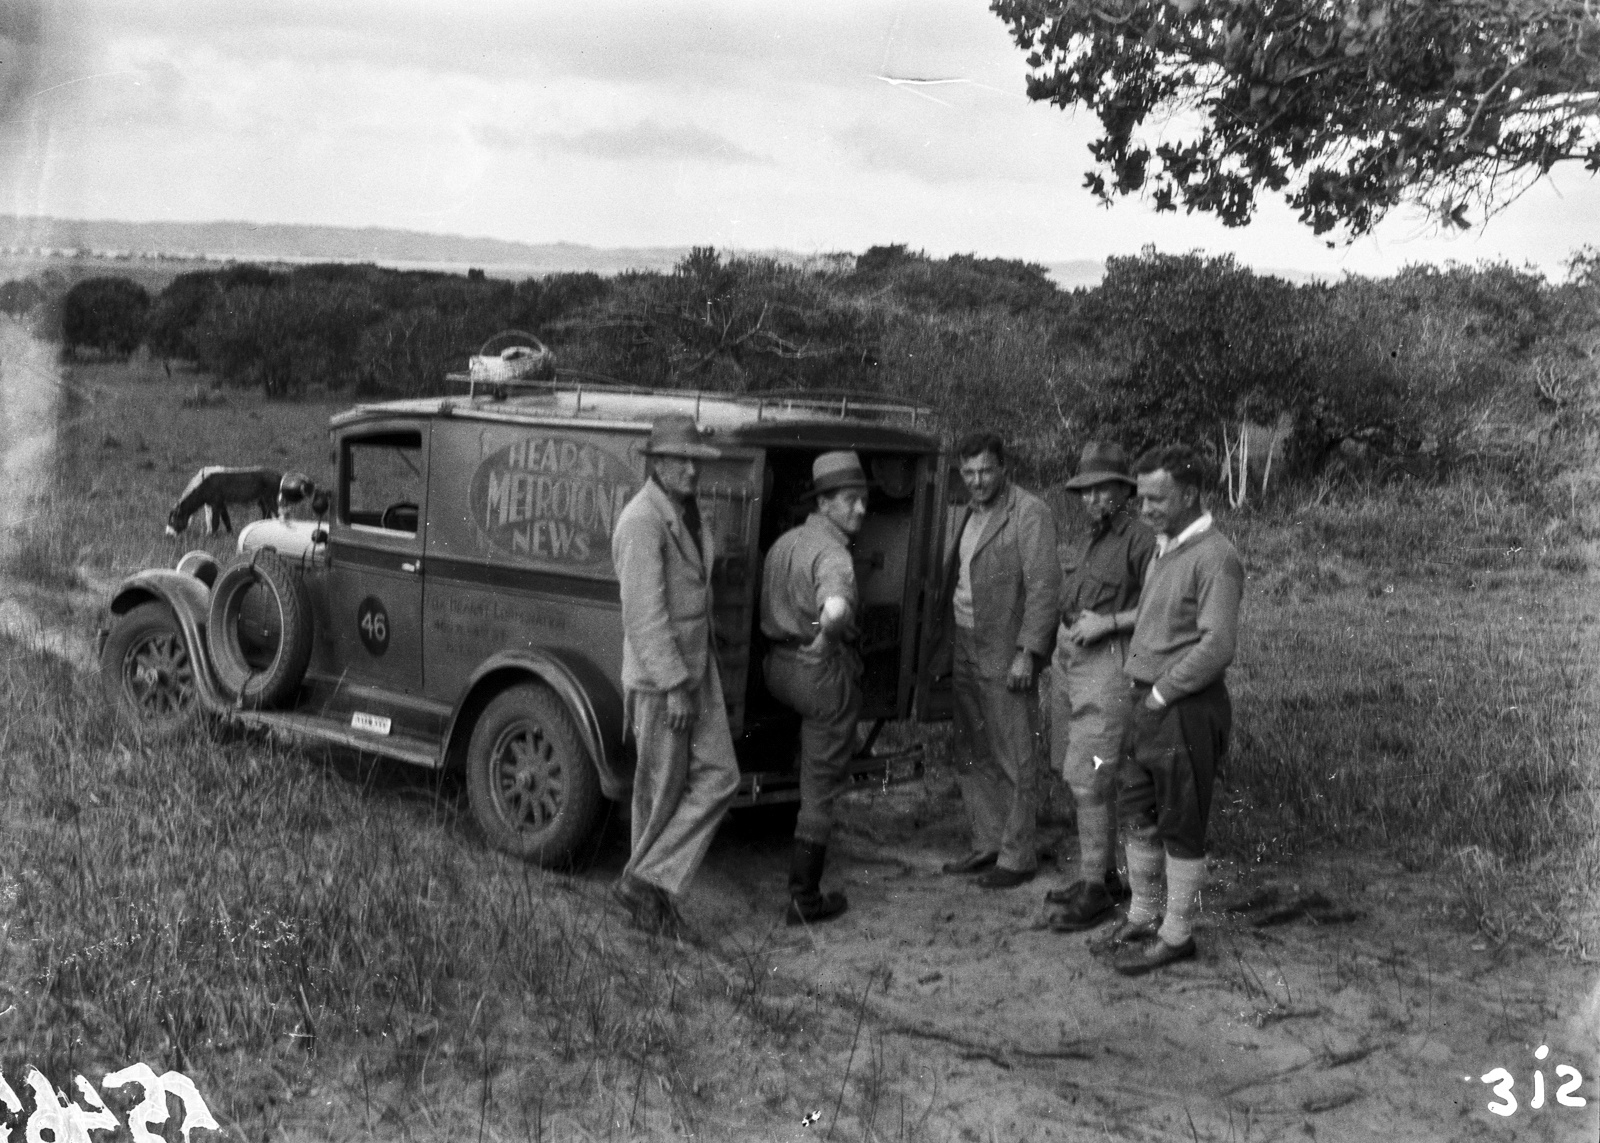 Южно-Африканский Союз. Квазулу-Наталь. Ханс Шомбургк и Пол Либеренц с журналистами перед грузовиком Hearst Metrotone News